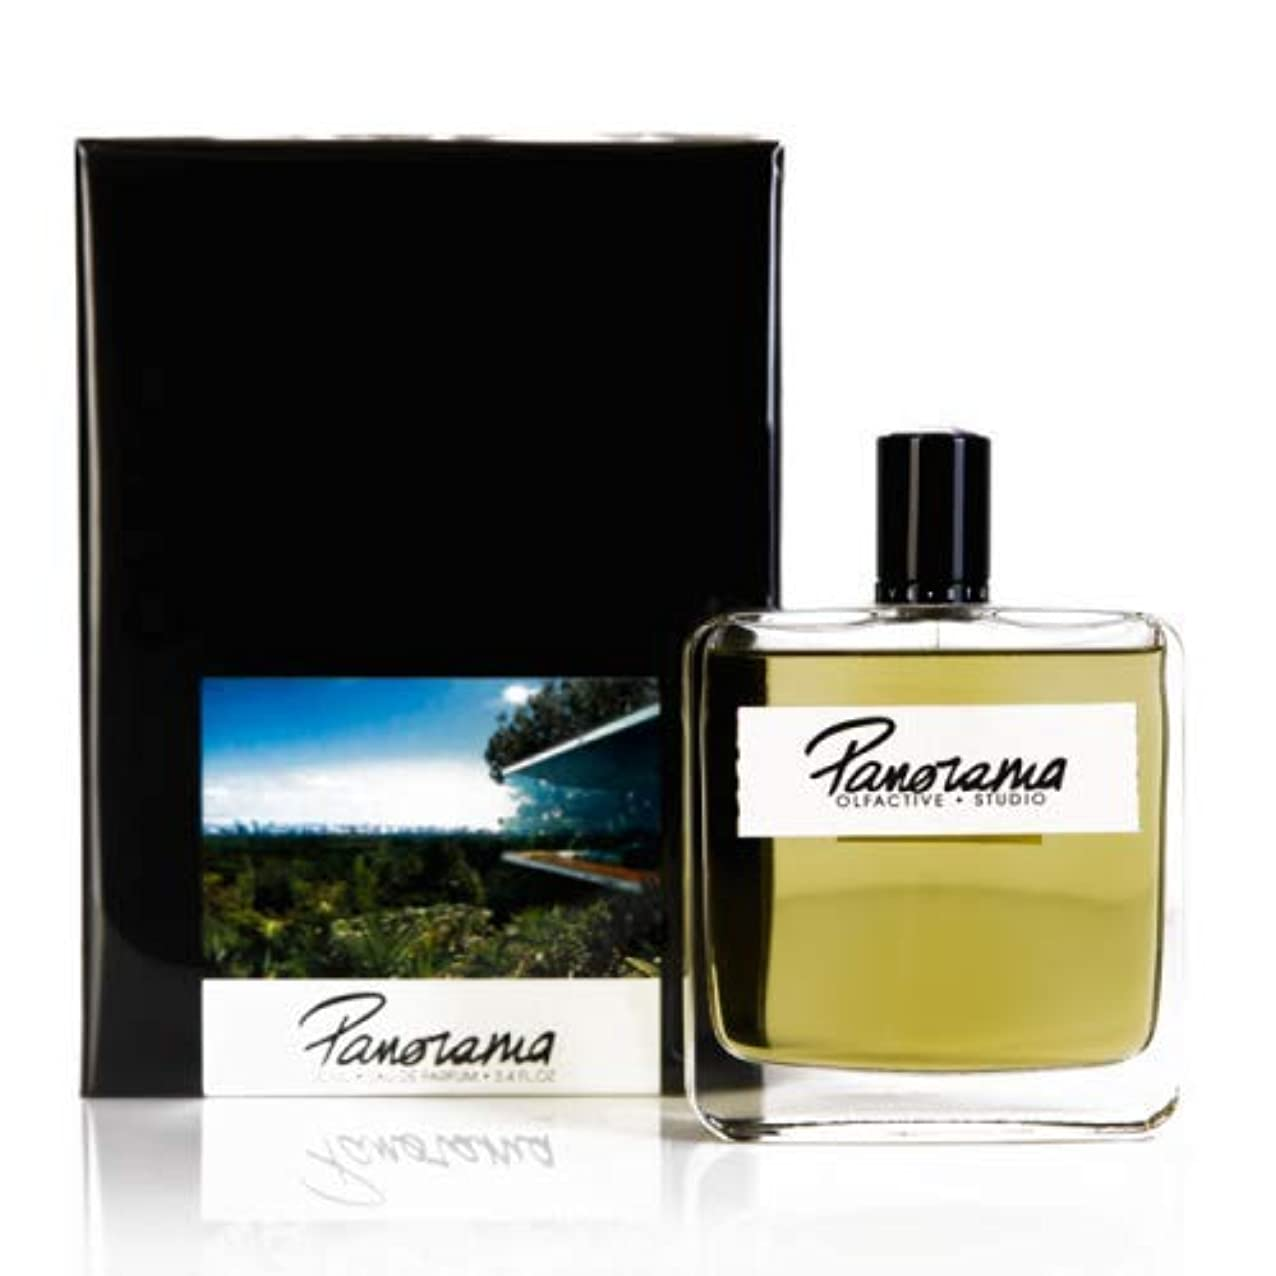 関税灌漑実現可能Olfactive Studio Panorama Eau de Parfum 3.4 oz./100 ml New in Box